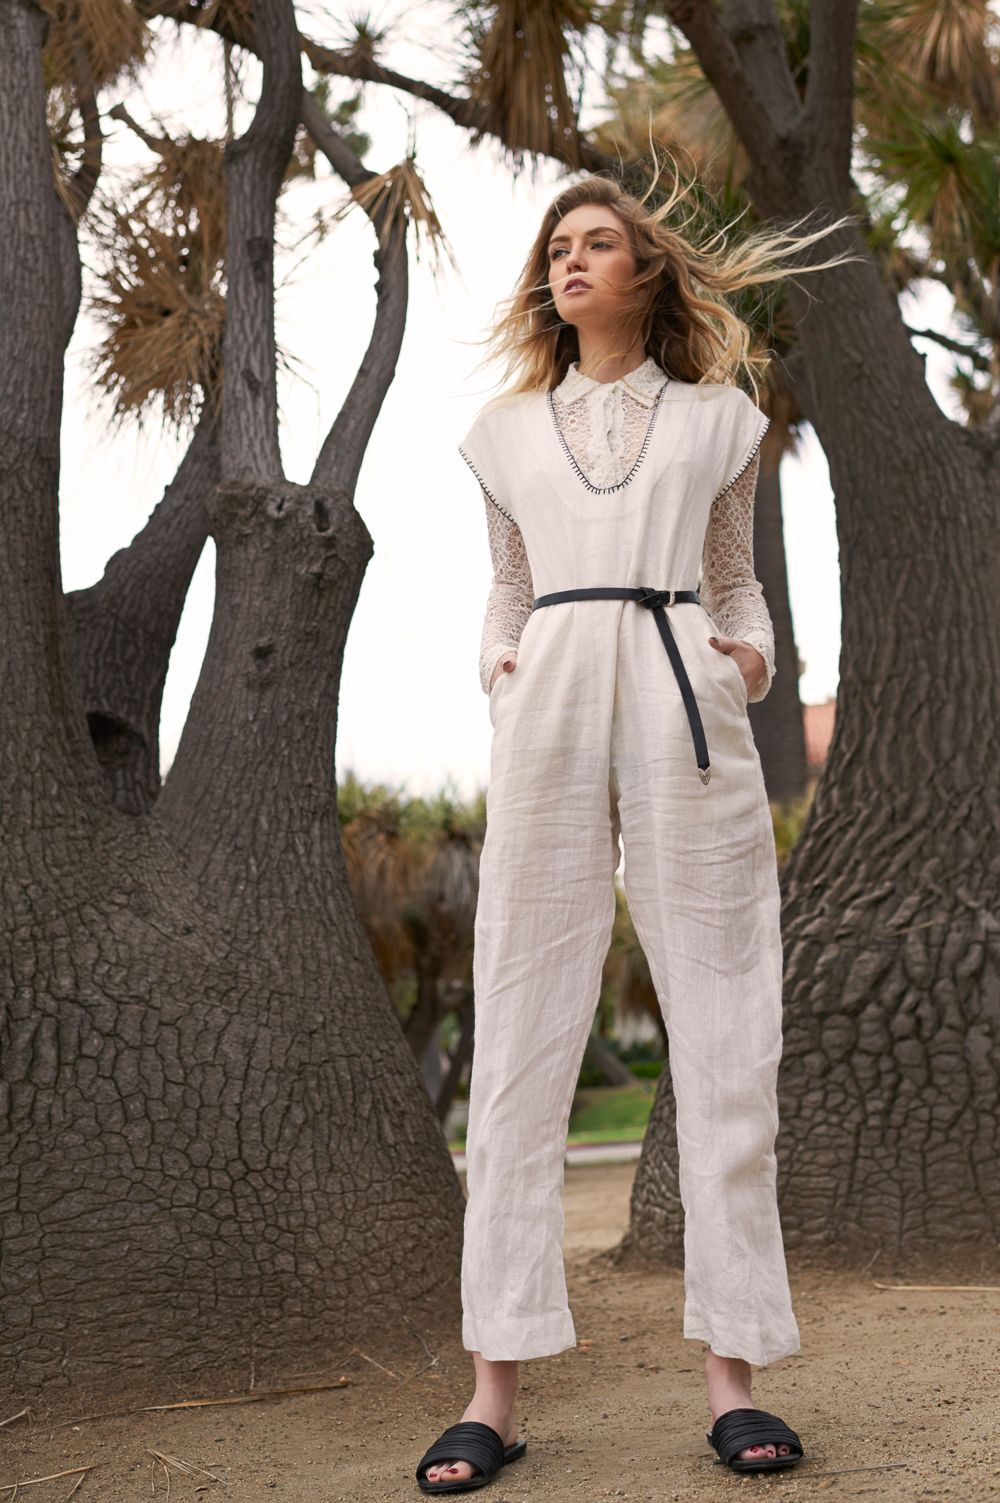 foto Chanel gray wilhelmina models